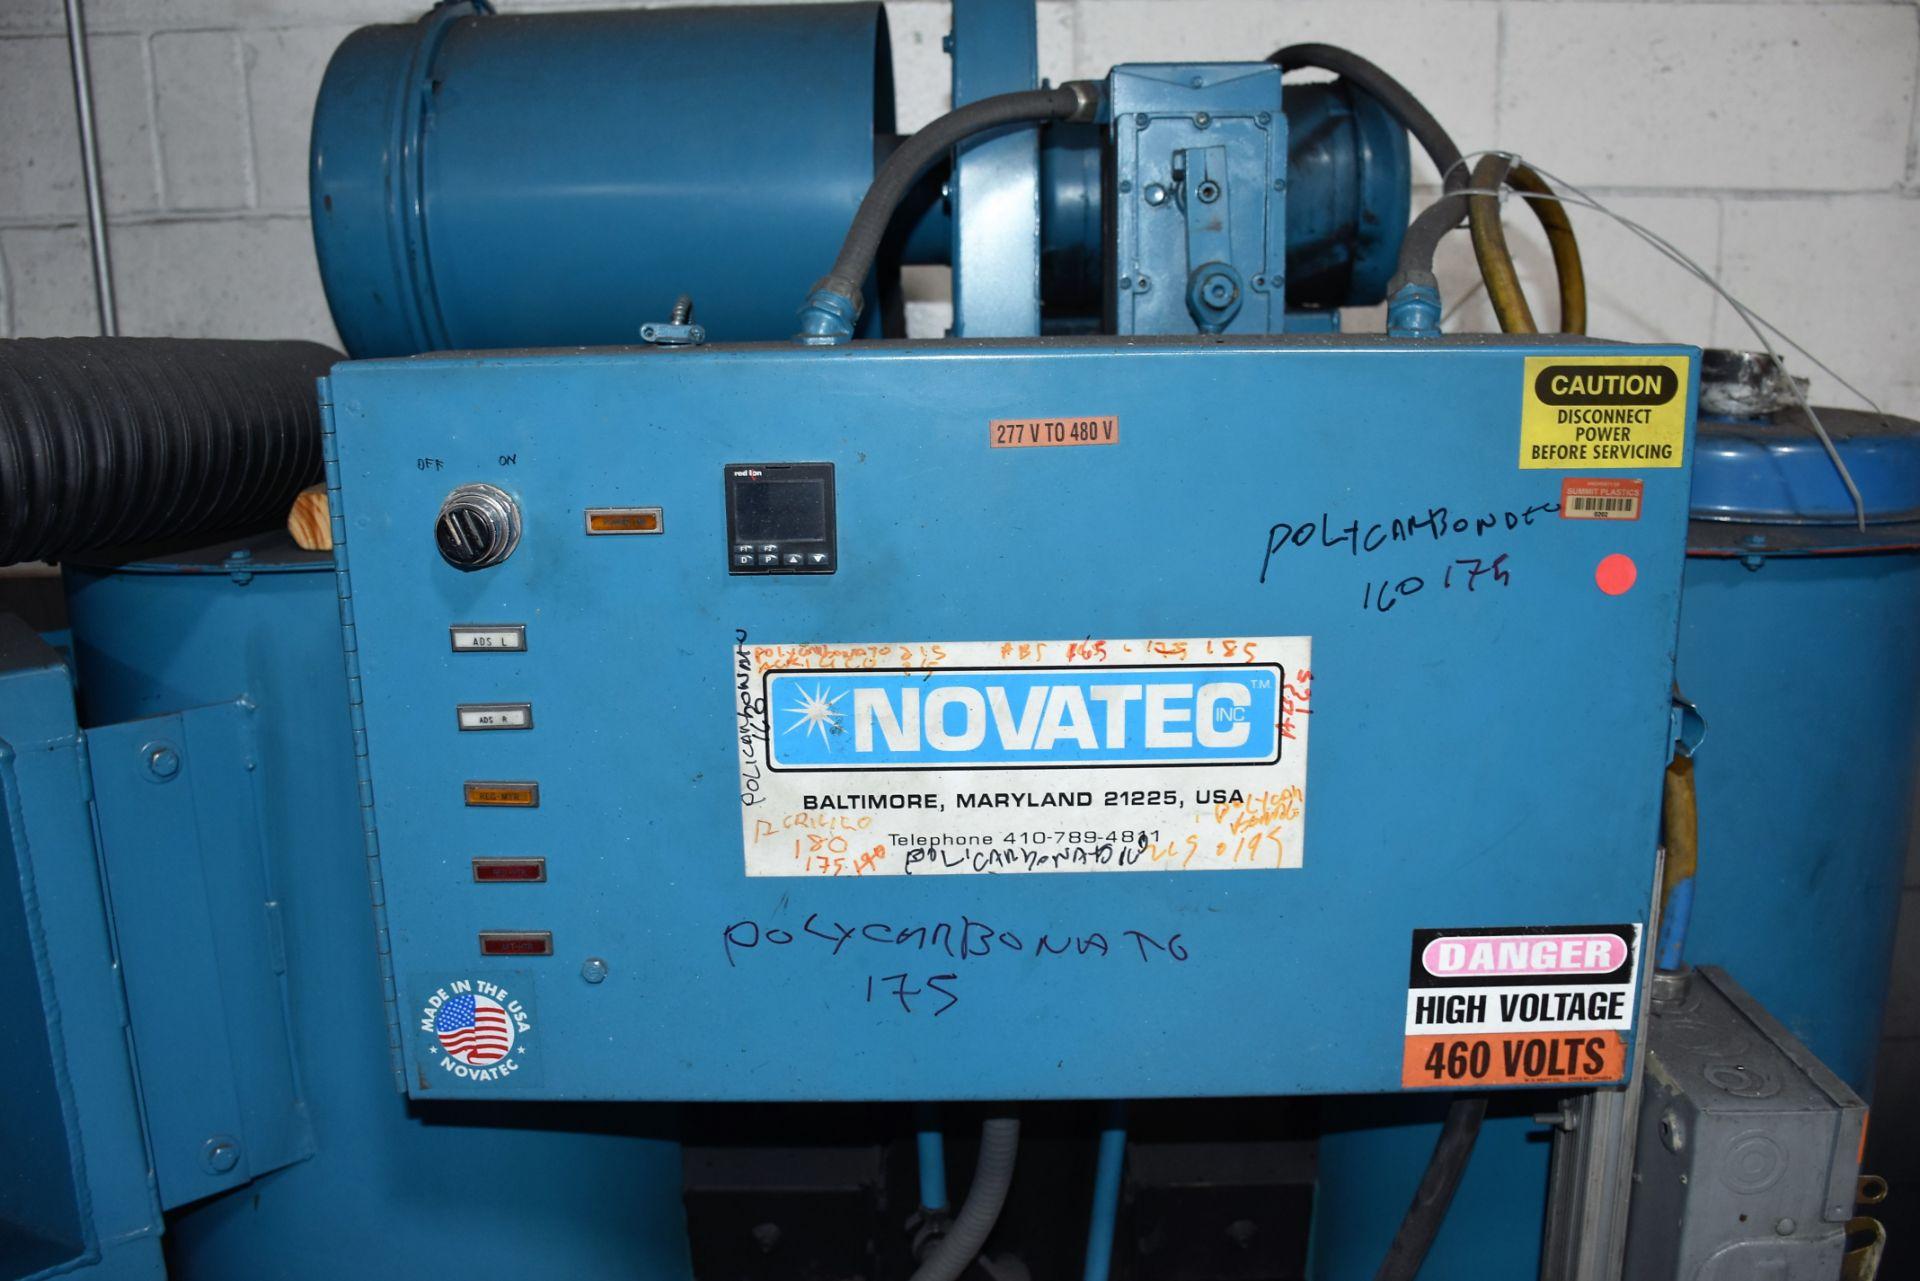 Novatec Vacum & Dryer - Image 4 of 4